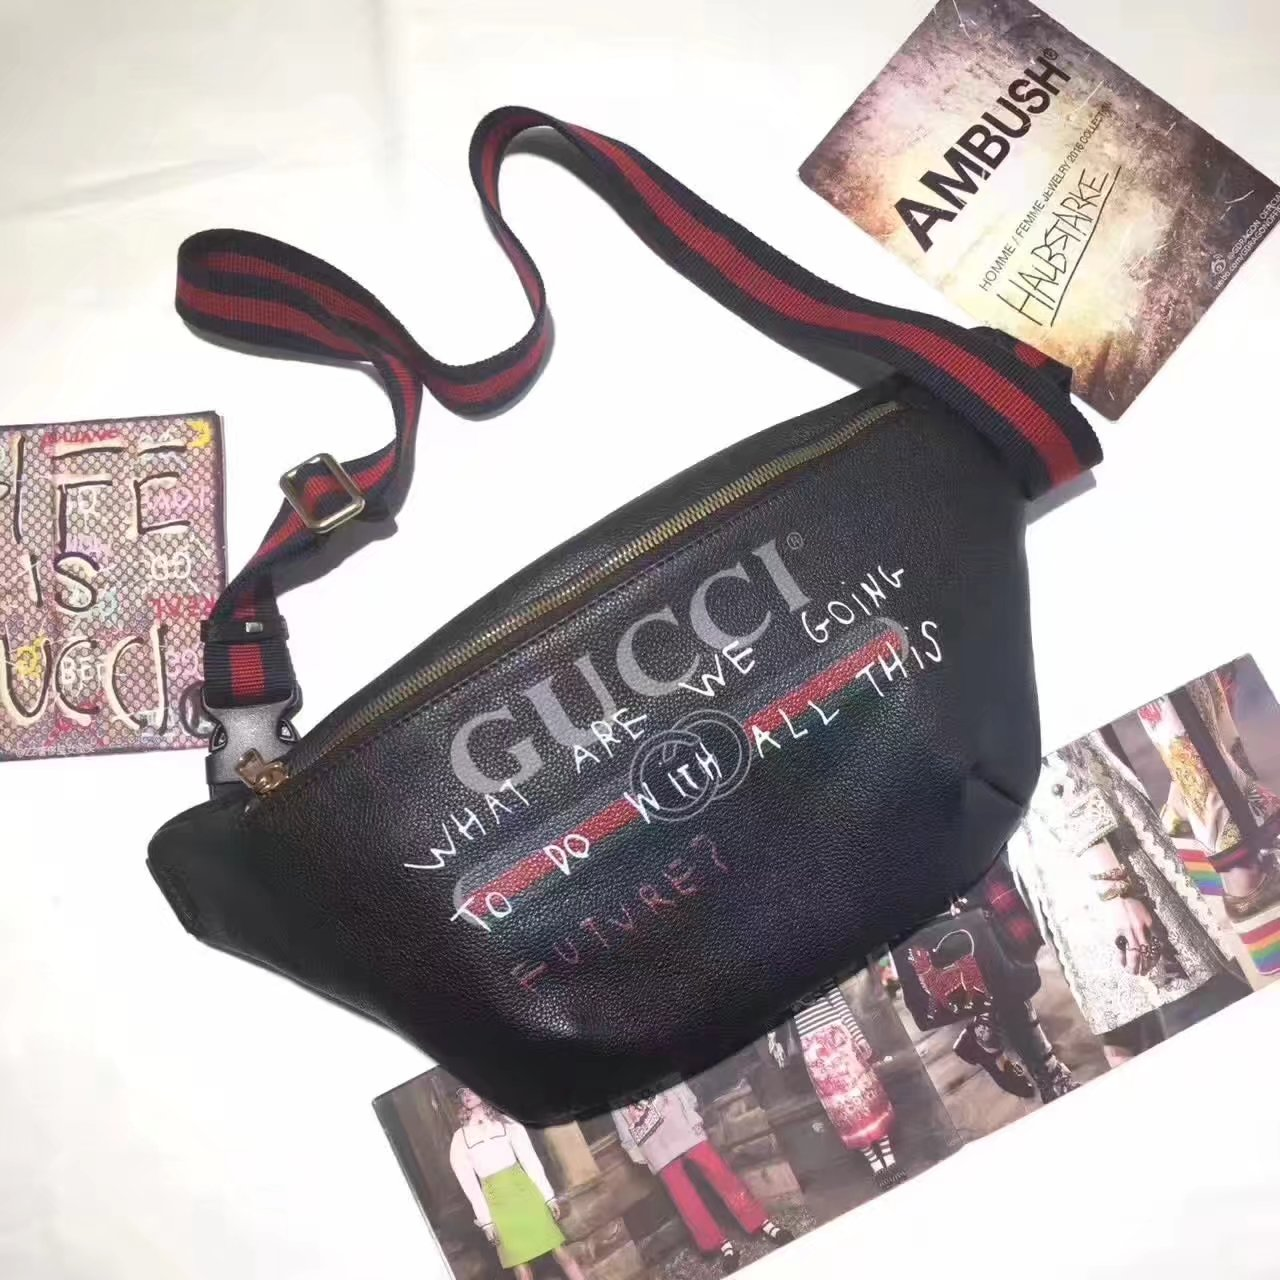 Gucci 493869 Women Print Leather Belt Bag Black